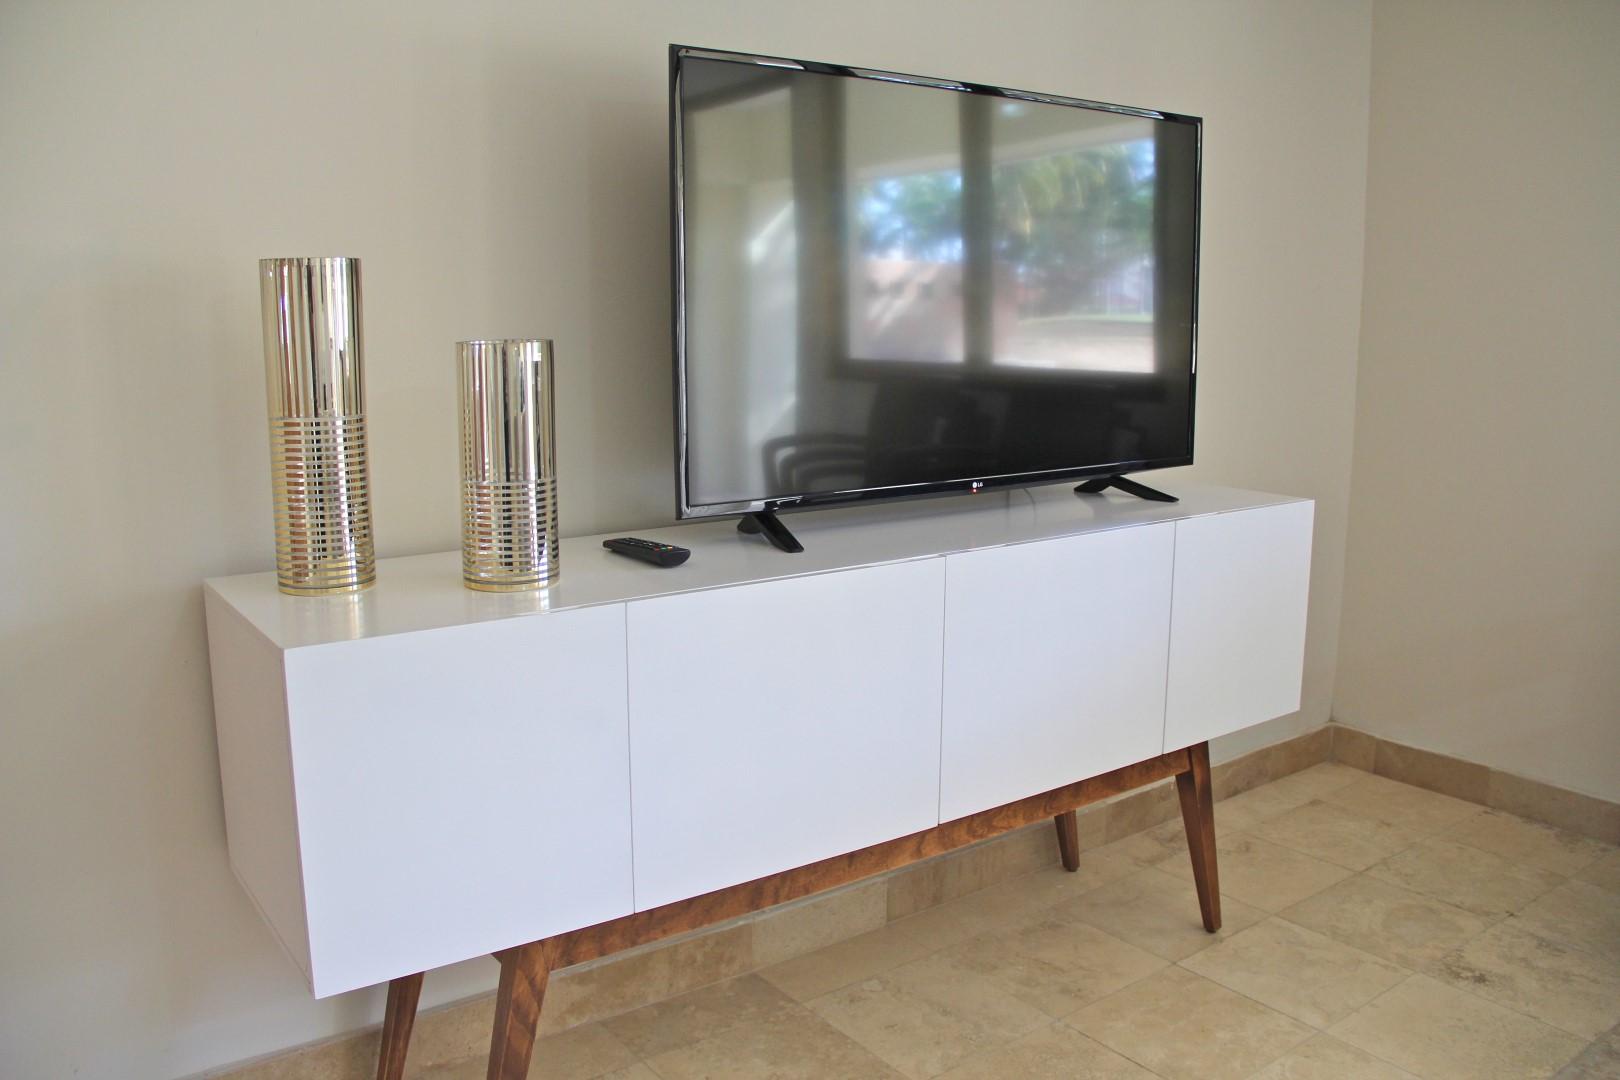 Flatscreen TV in living room